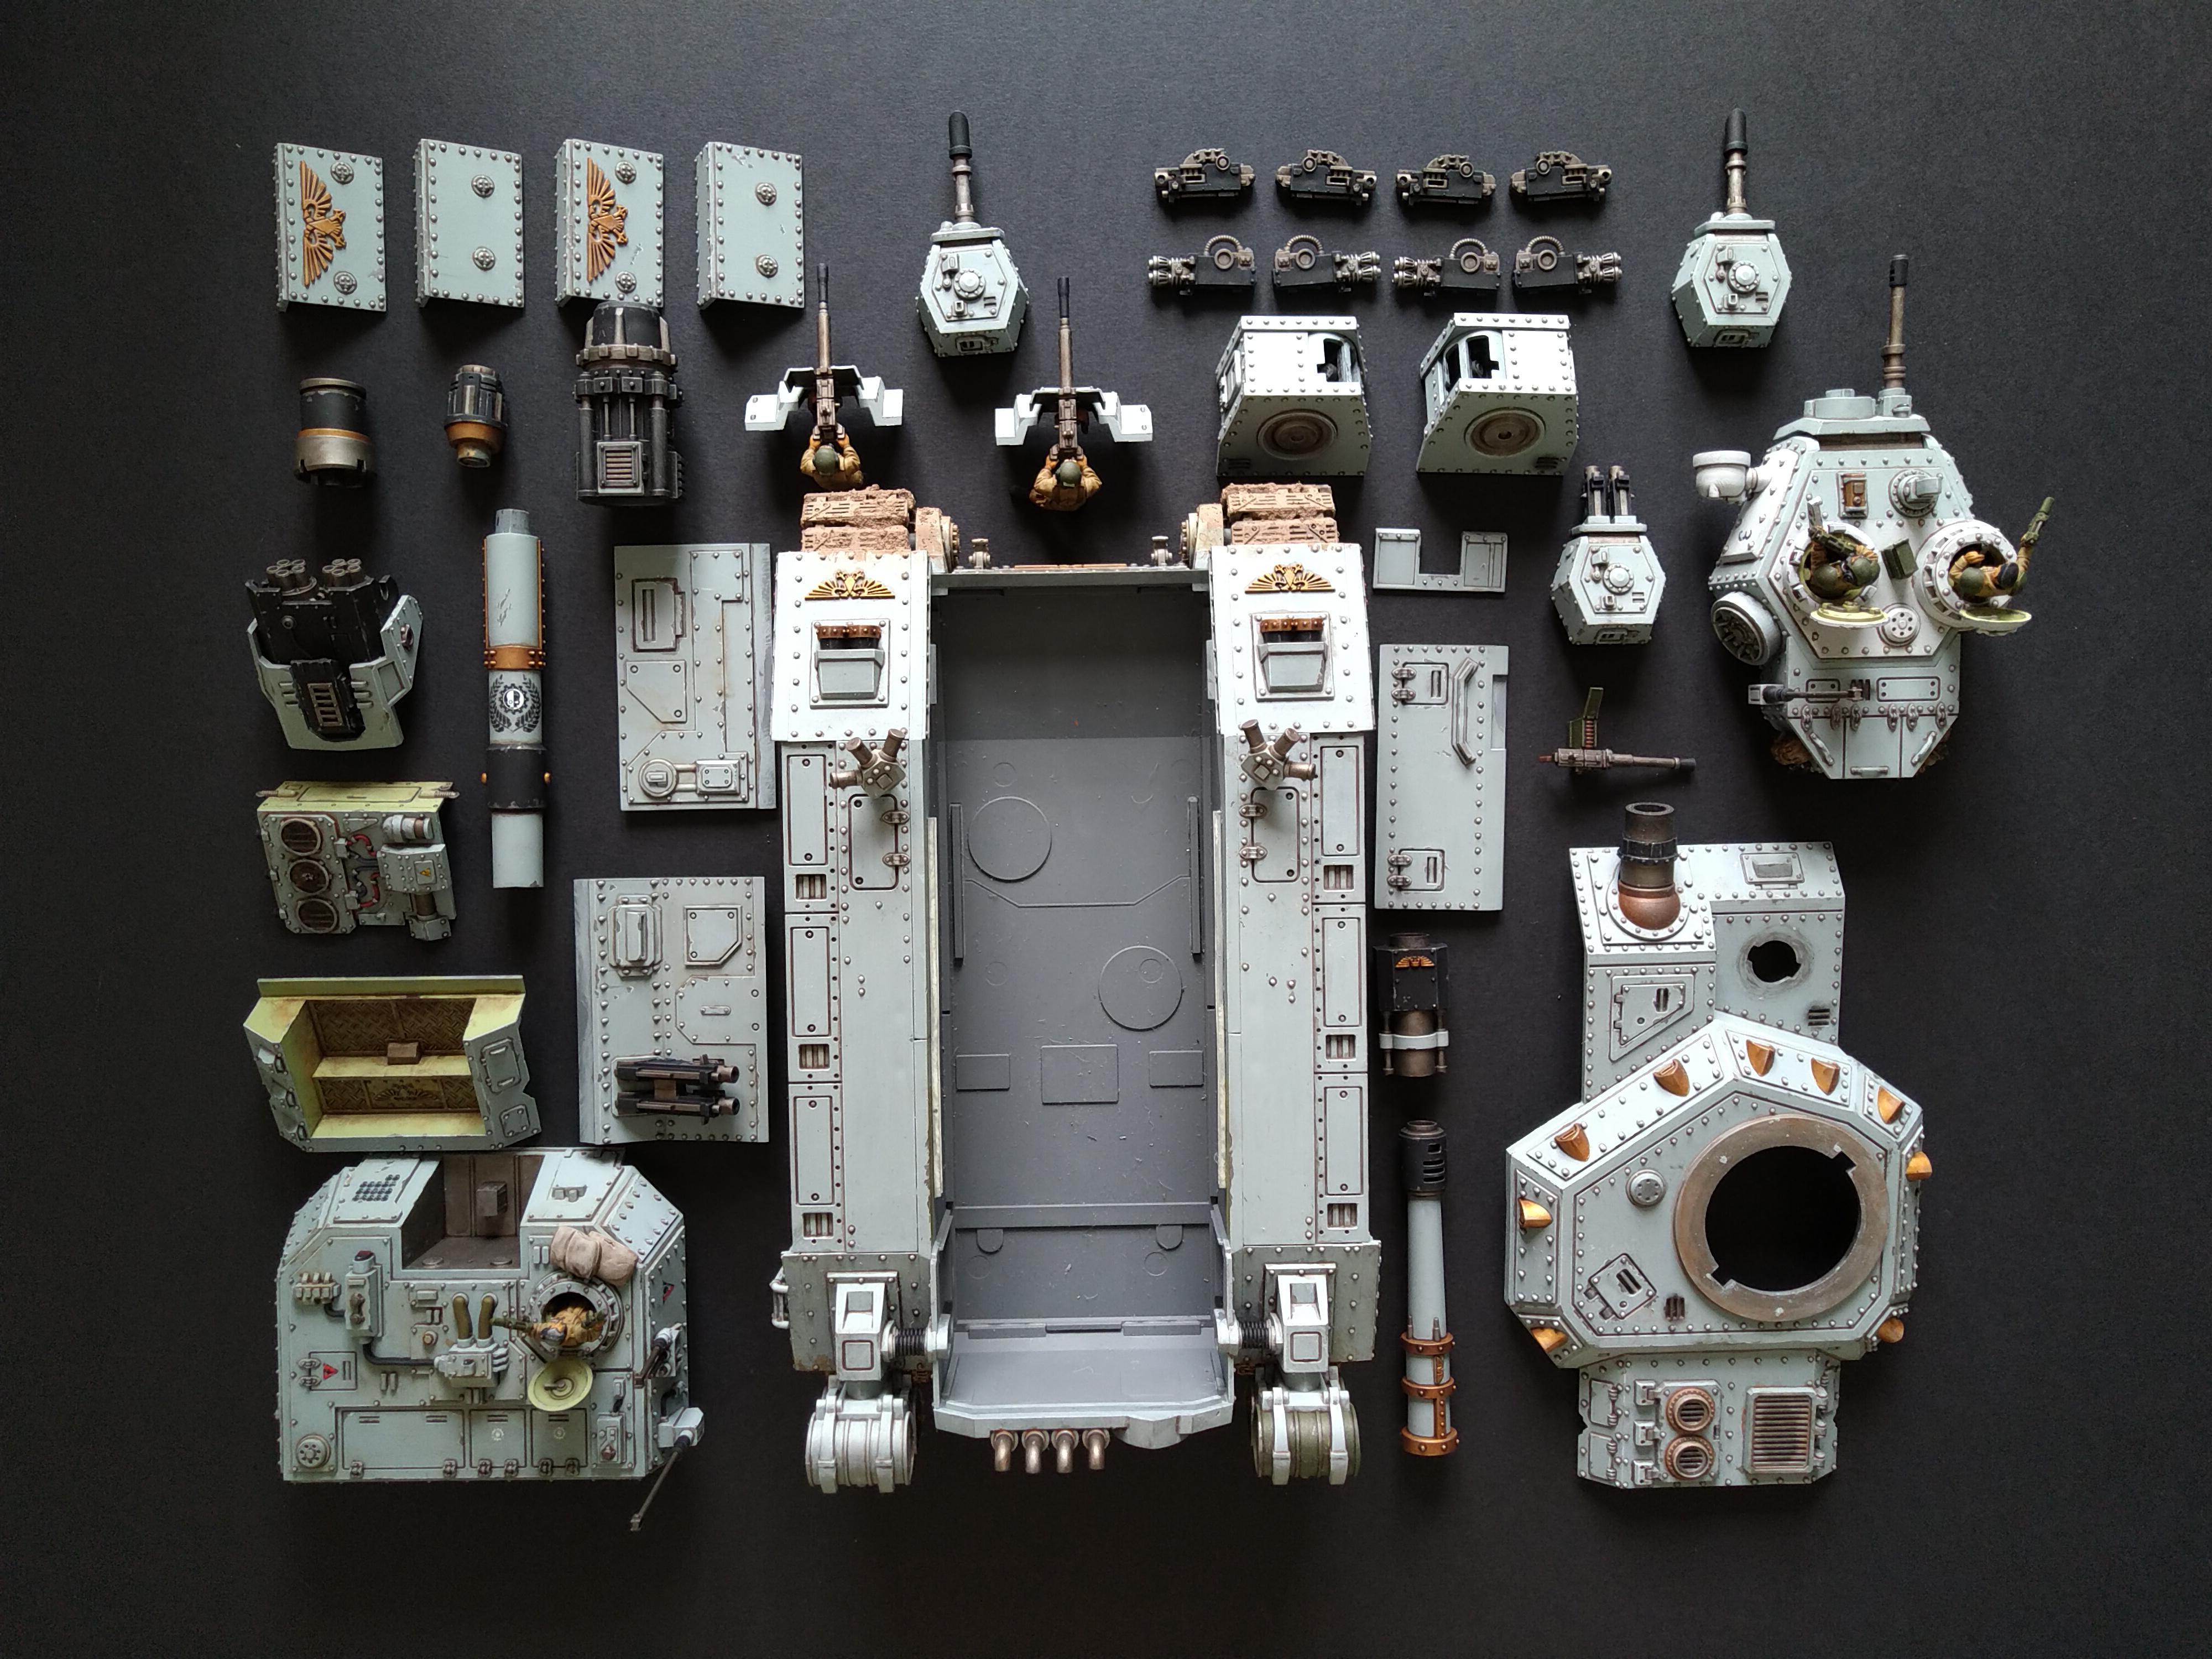 Am, Astra Militarum, Baneblade, Exploded View, Grey, Magnet, Tank, Warhammer 40,000